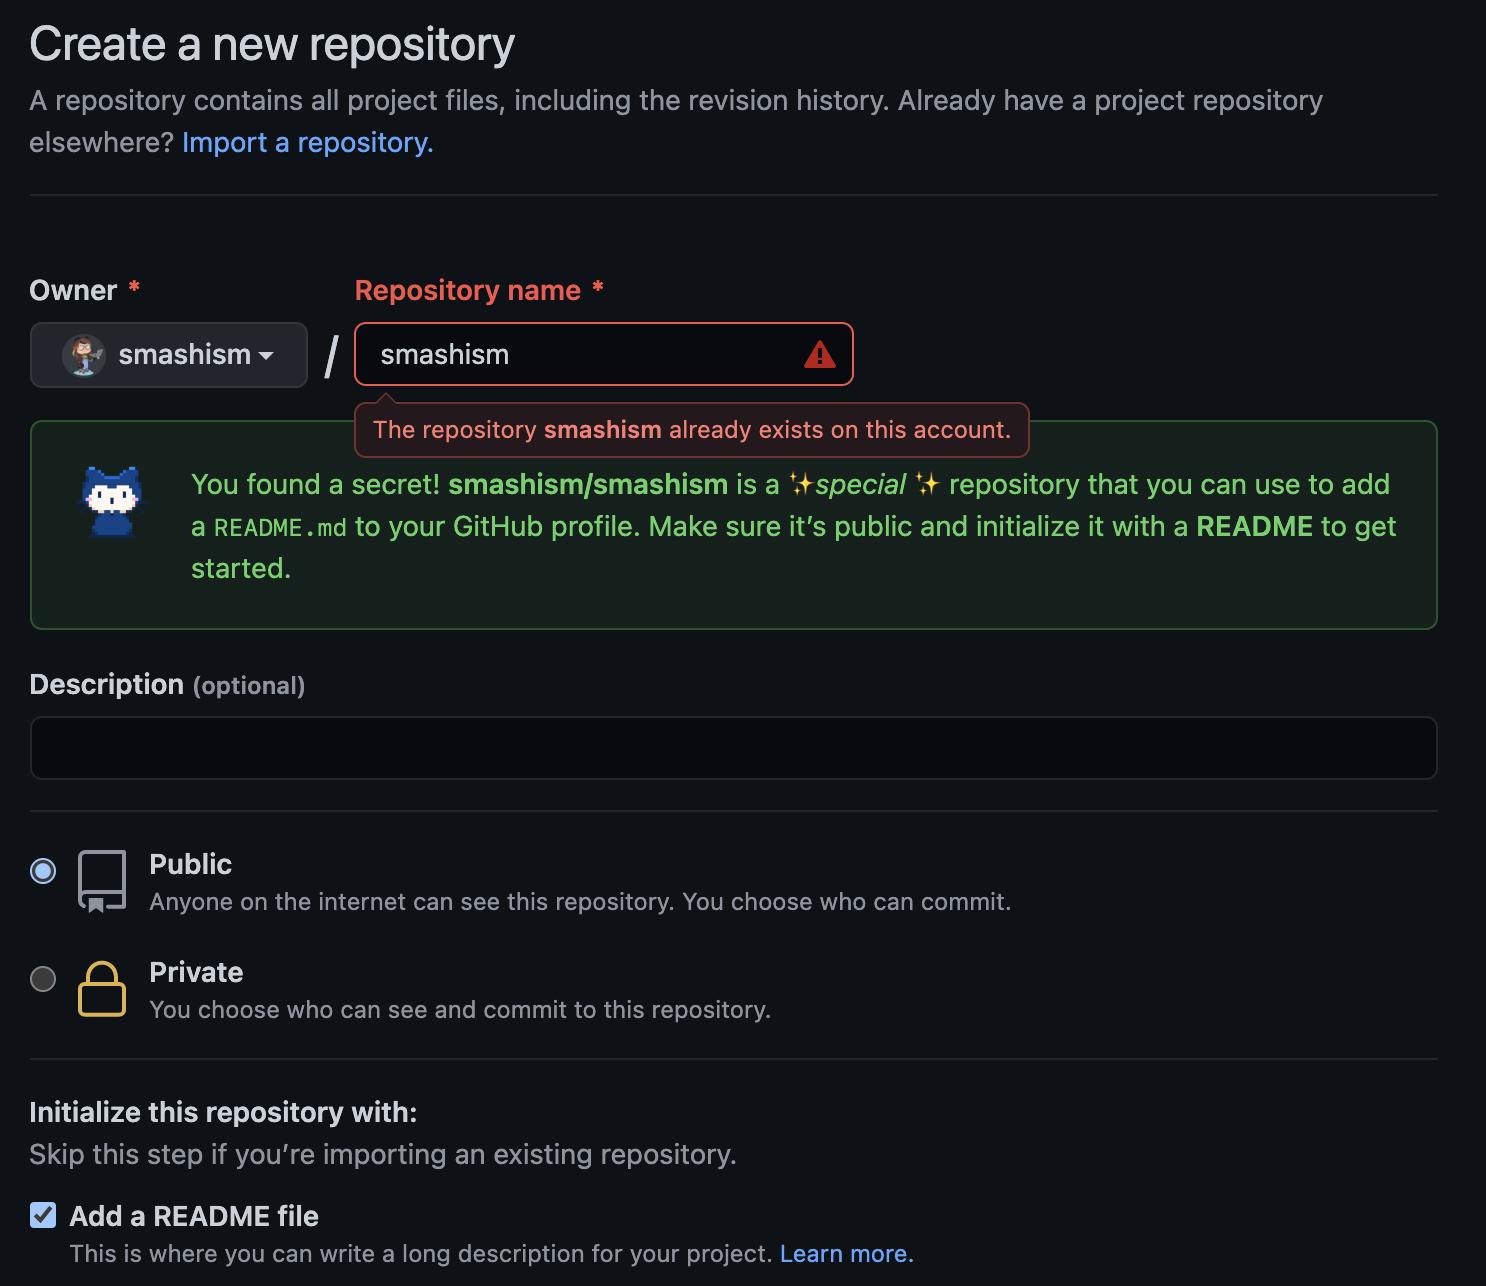 Screenshot of GitHub.com/new where a profile has been created using the account username